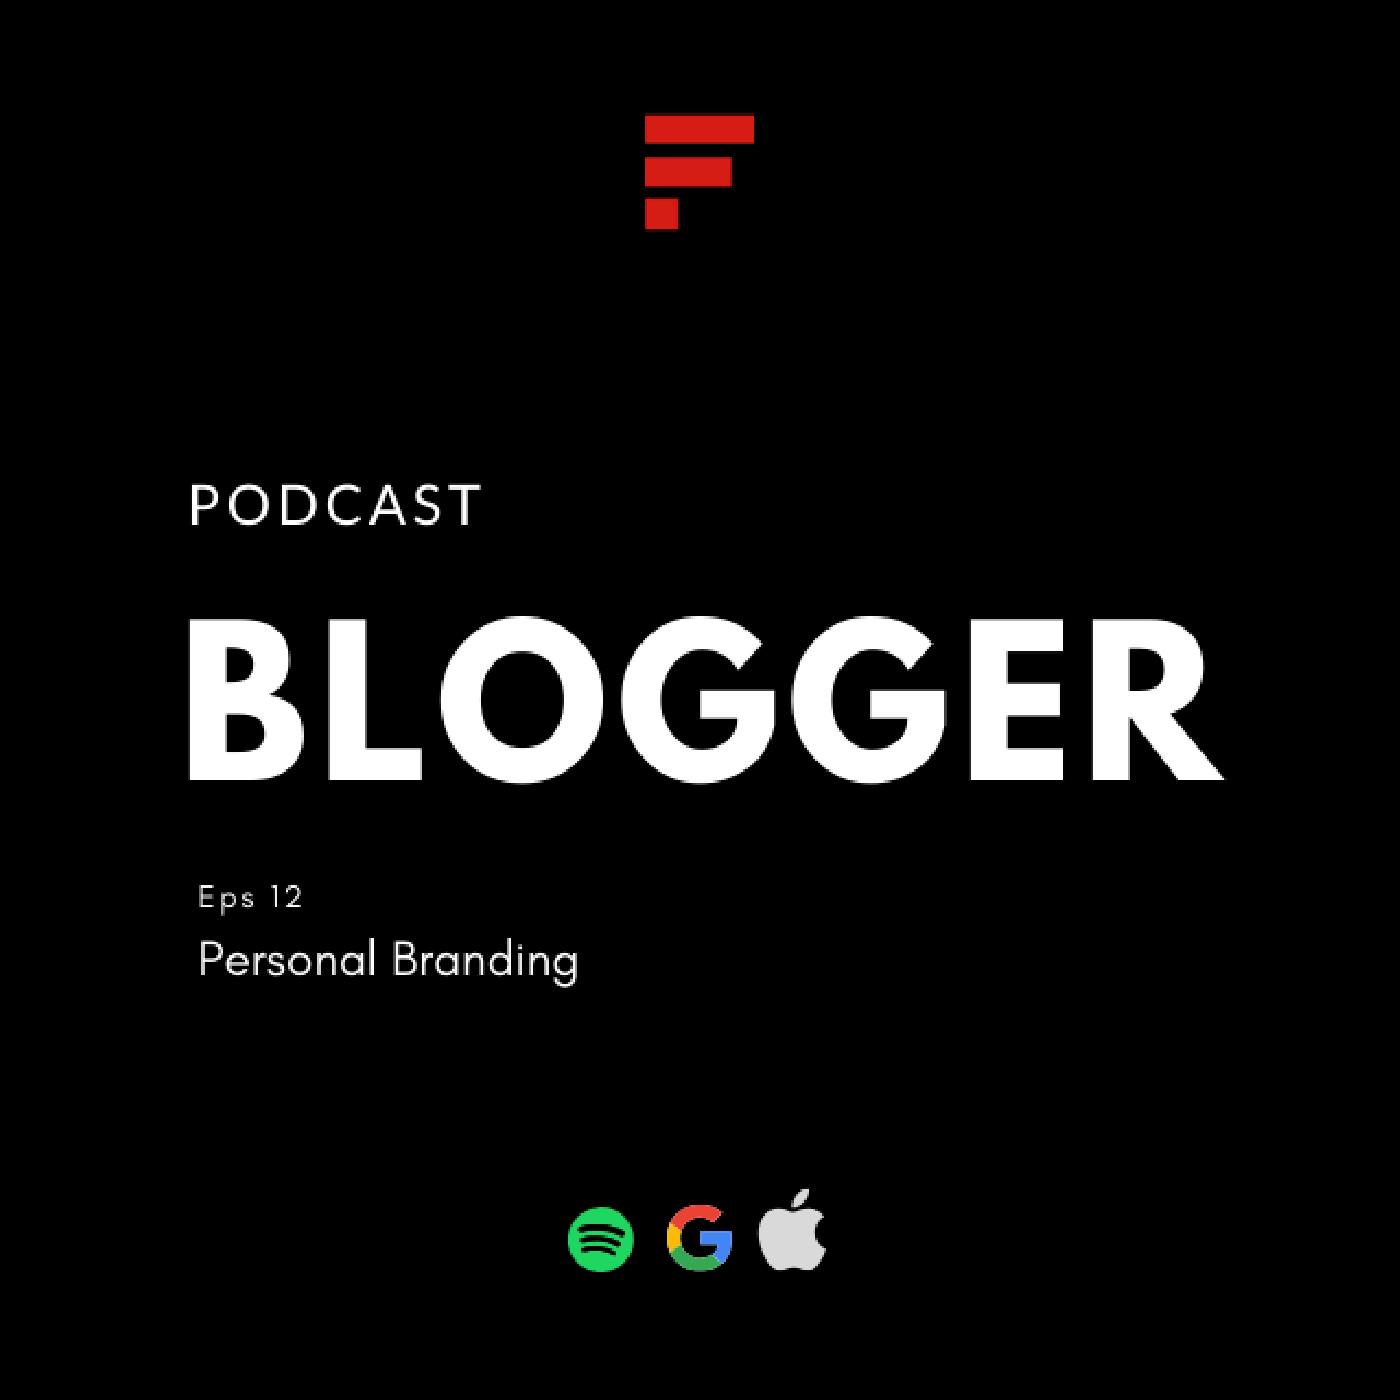 EPS12: Personal Branding